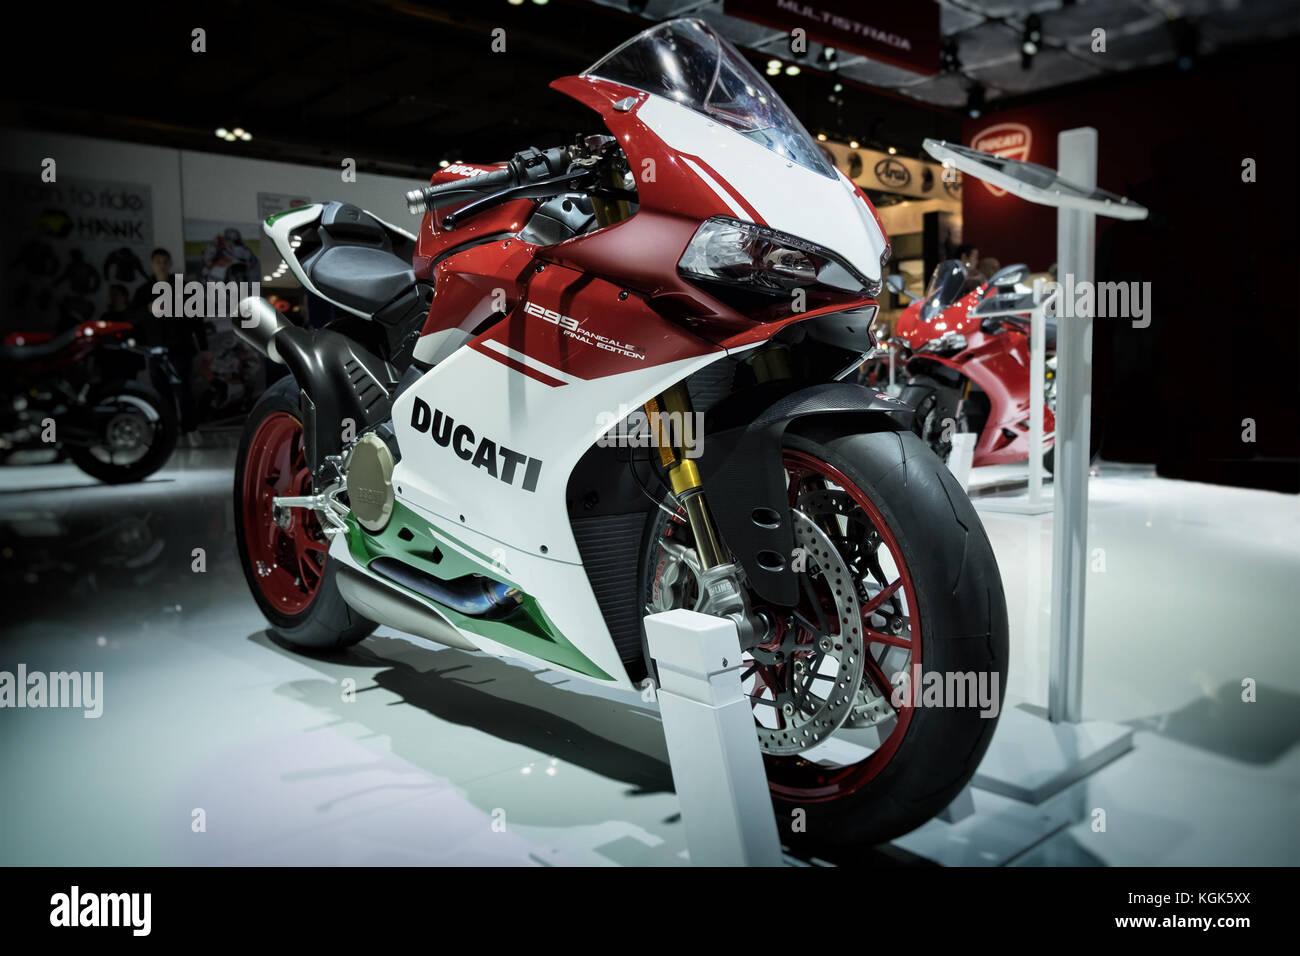 New Ducati Panigale 1299 FINAL EDITION motorbike at EICMA Milan motorbike Expo Stock Photo